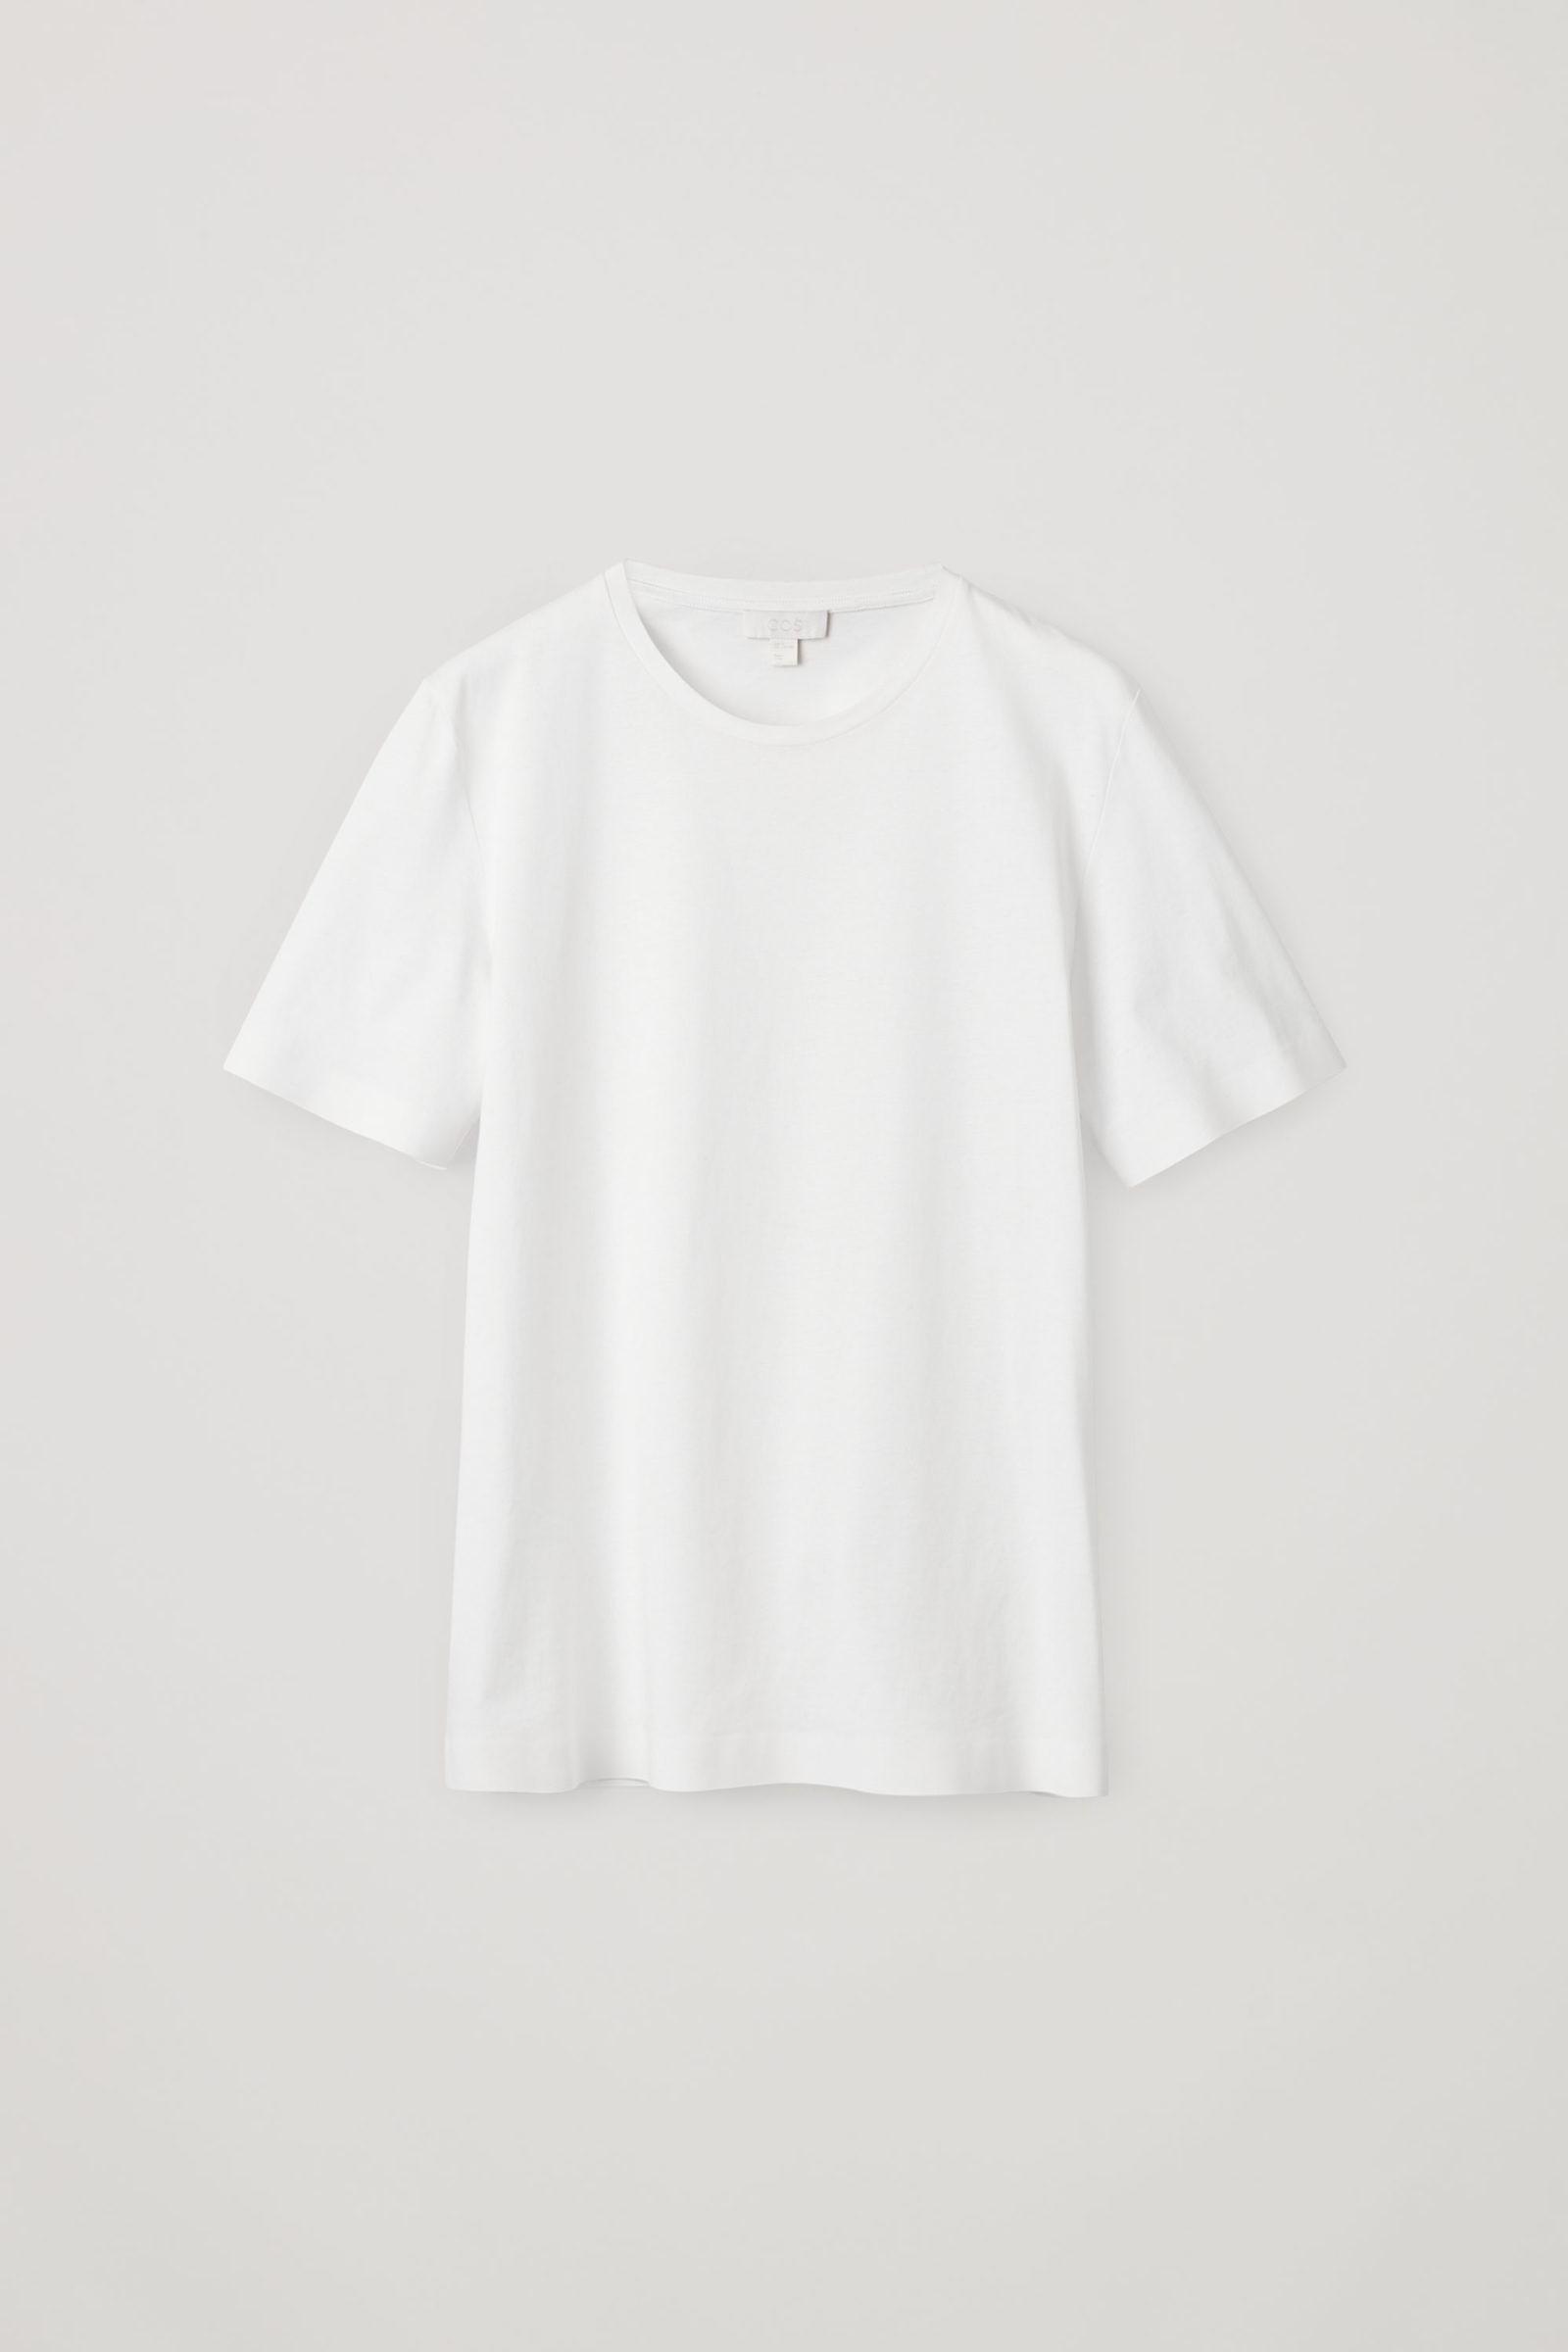 COS 본디드 코튼 티셔츠의 화이트컬러 Product입니다.